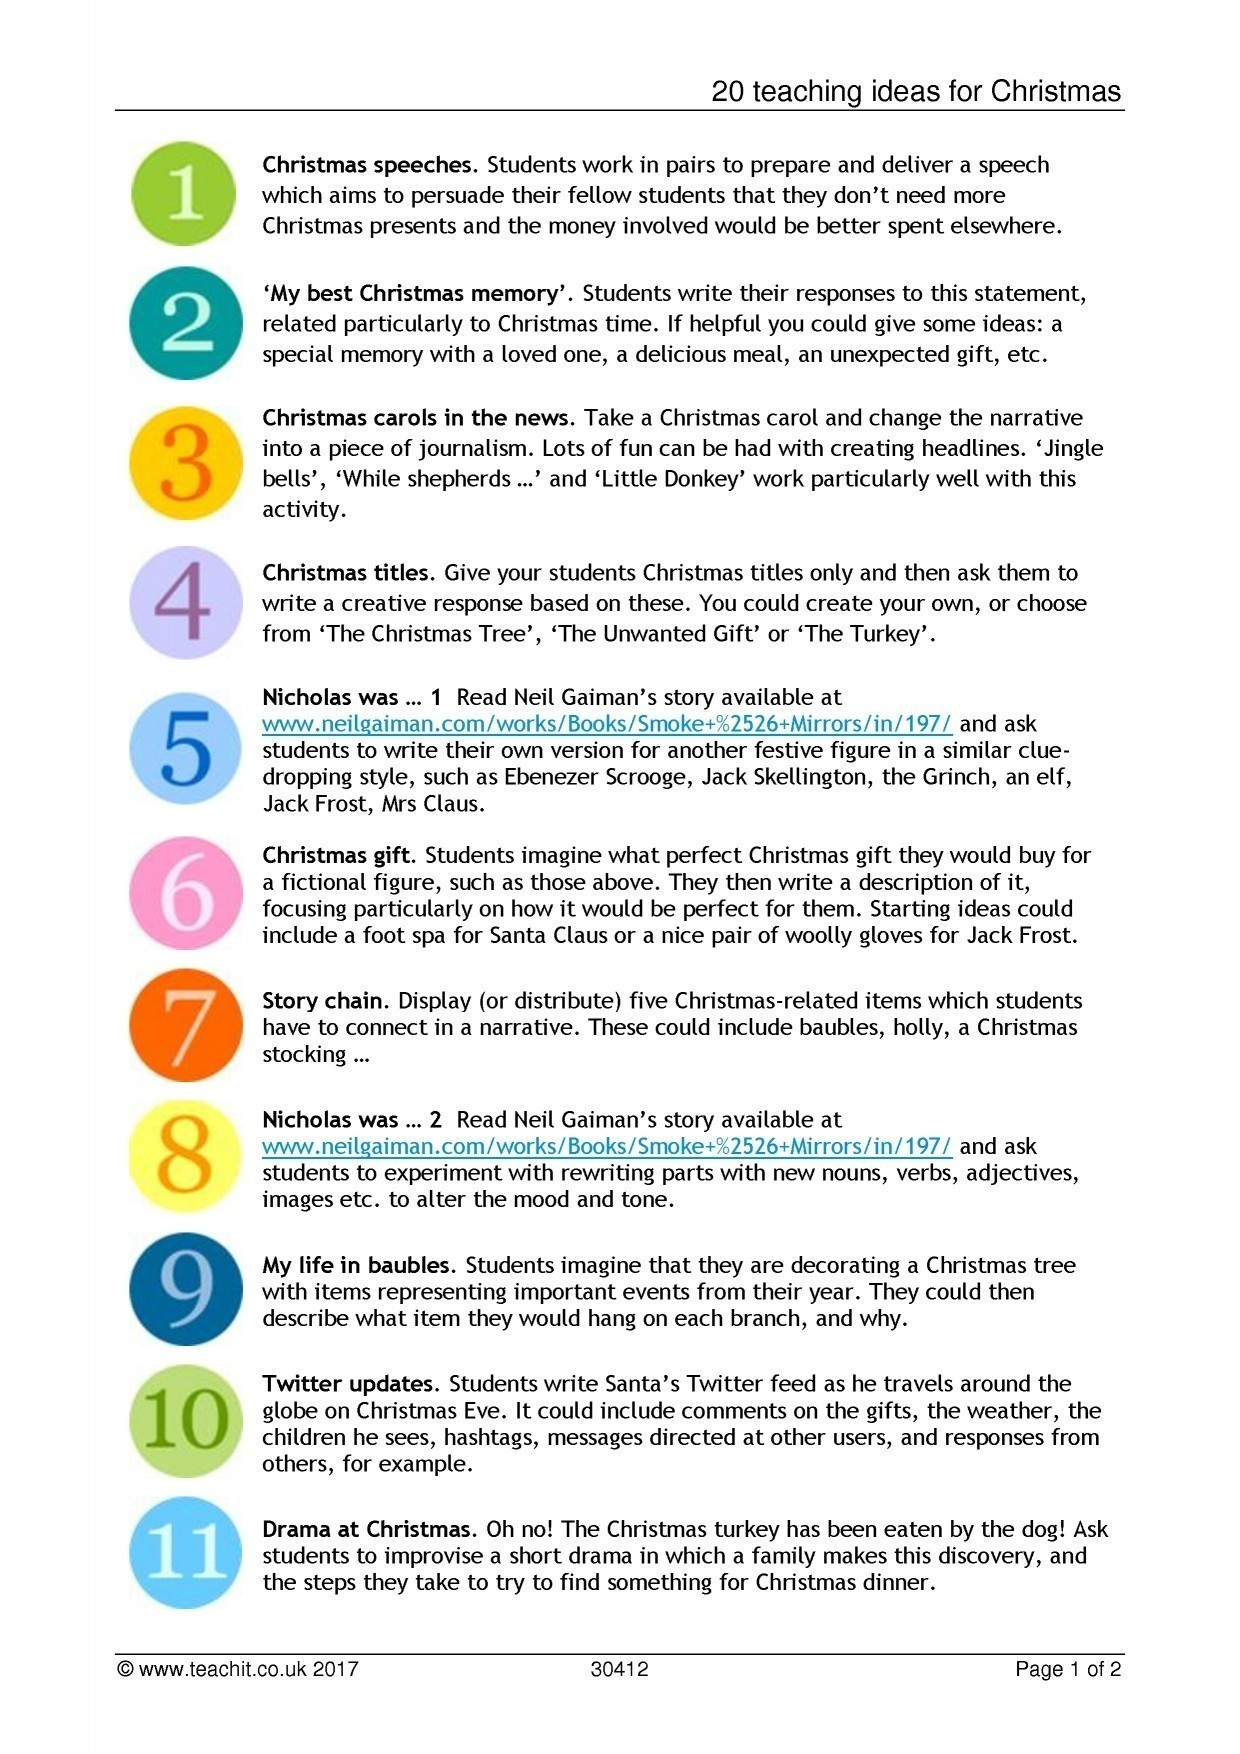 008 Critical Thinking Benefits Organization Of Life College Essay Peer I Want To Write Essays For Money Worksheets English Ks2 Fresh Worksheet Time In Inspirationa Fascinating Expository Persuasive Methods Argumentative Full